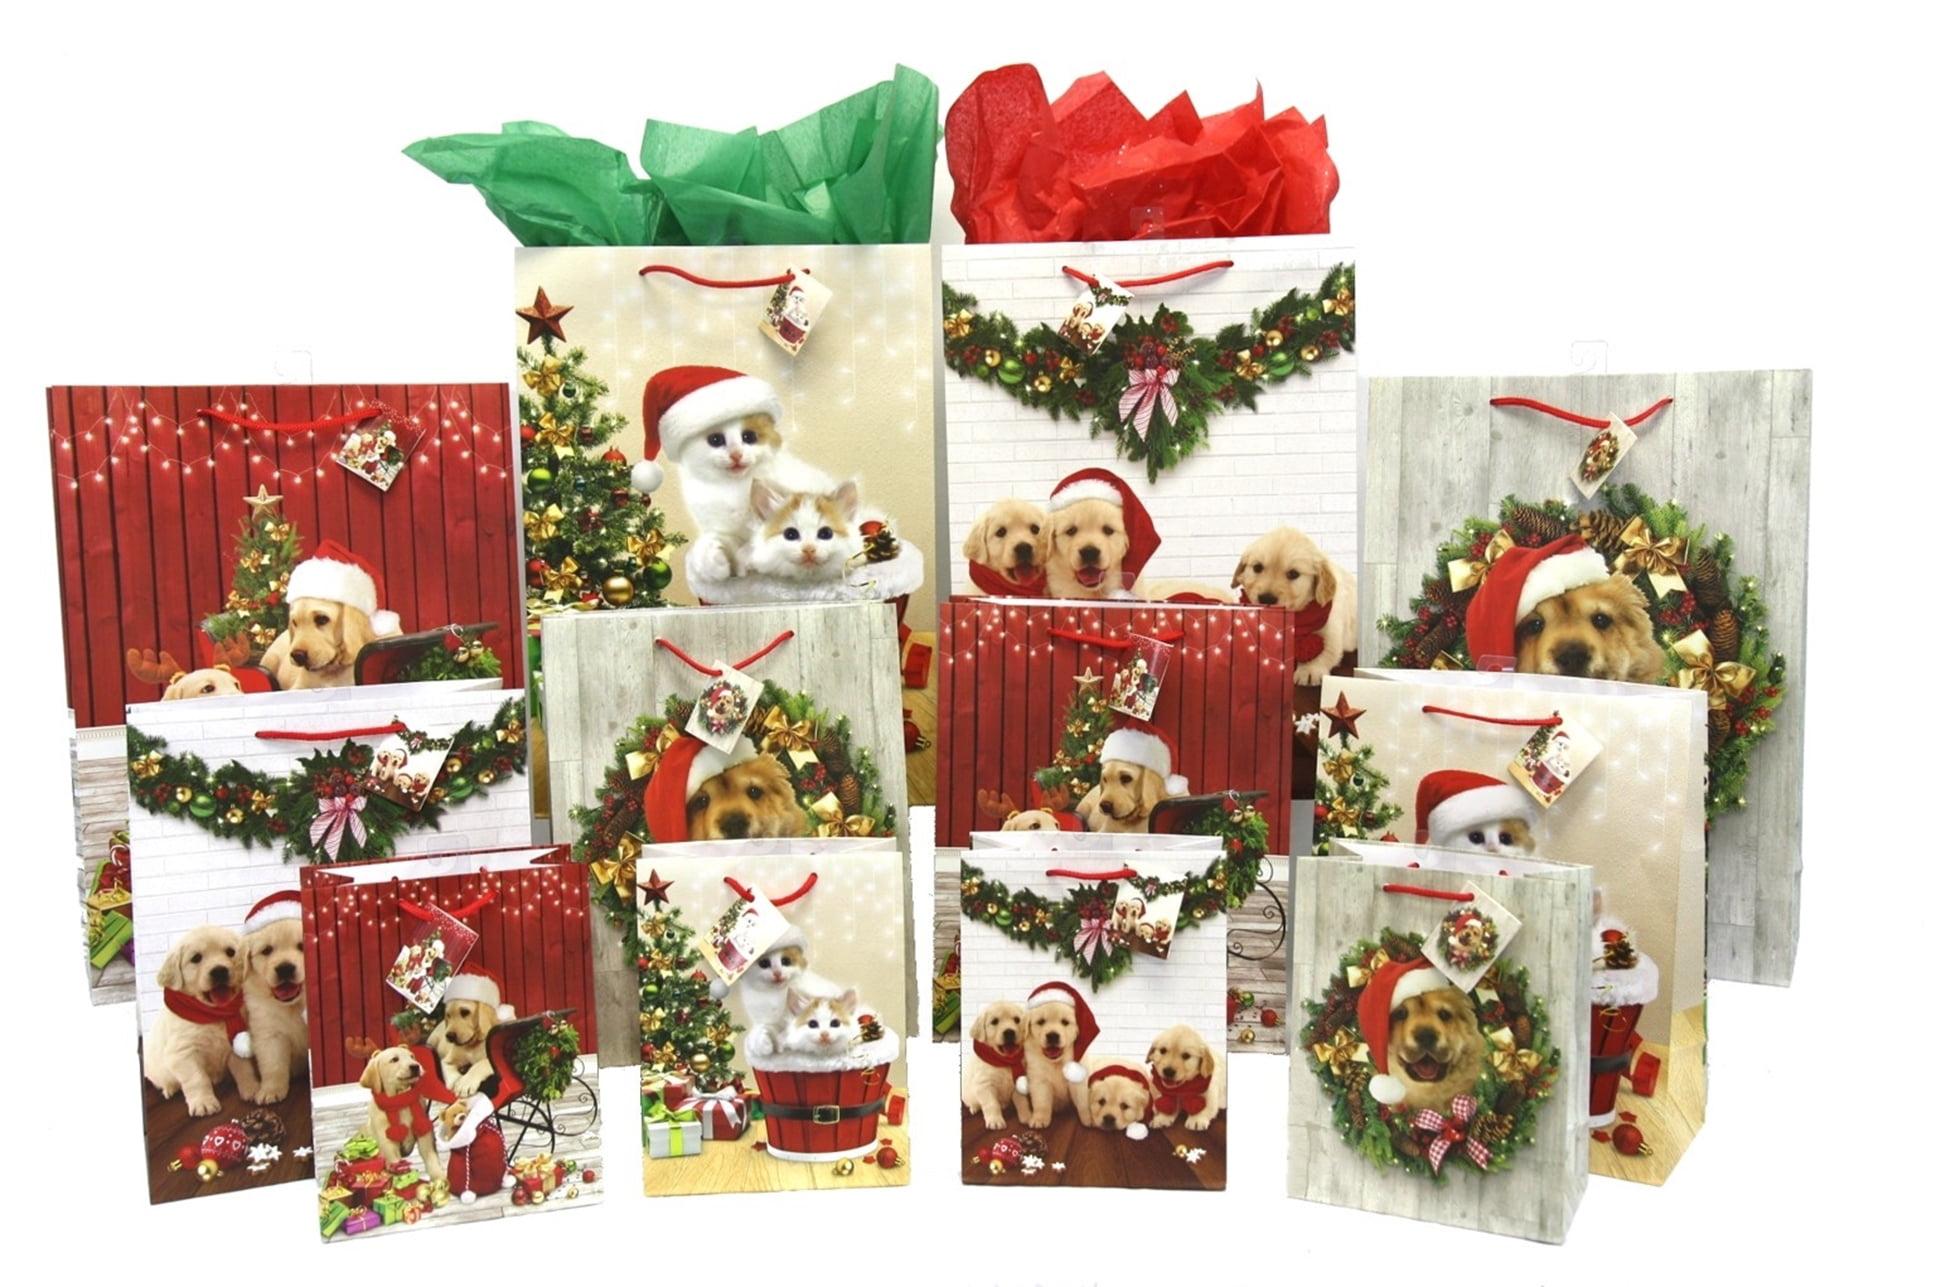 pk douglass christmas gift bags puppies kittens 12 bags